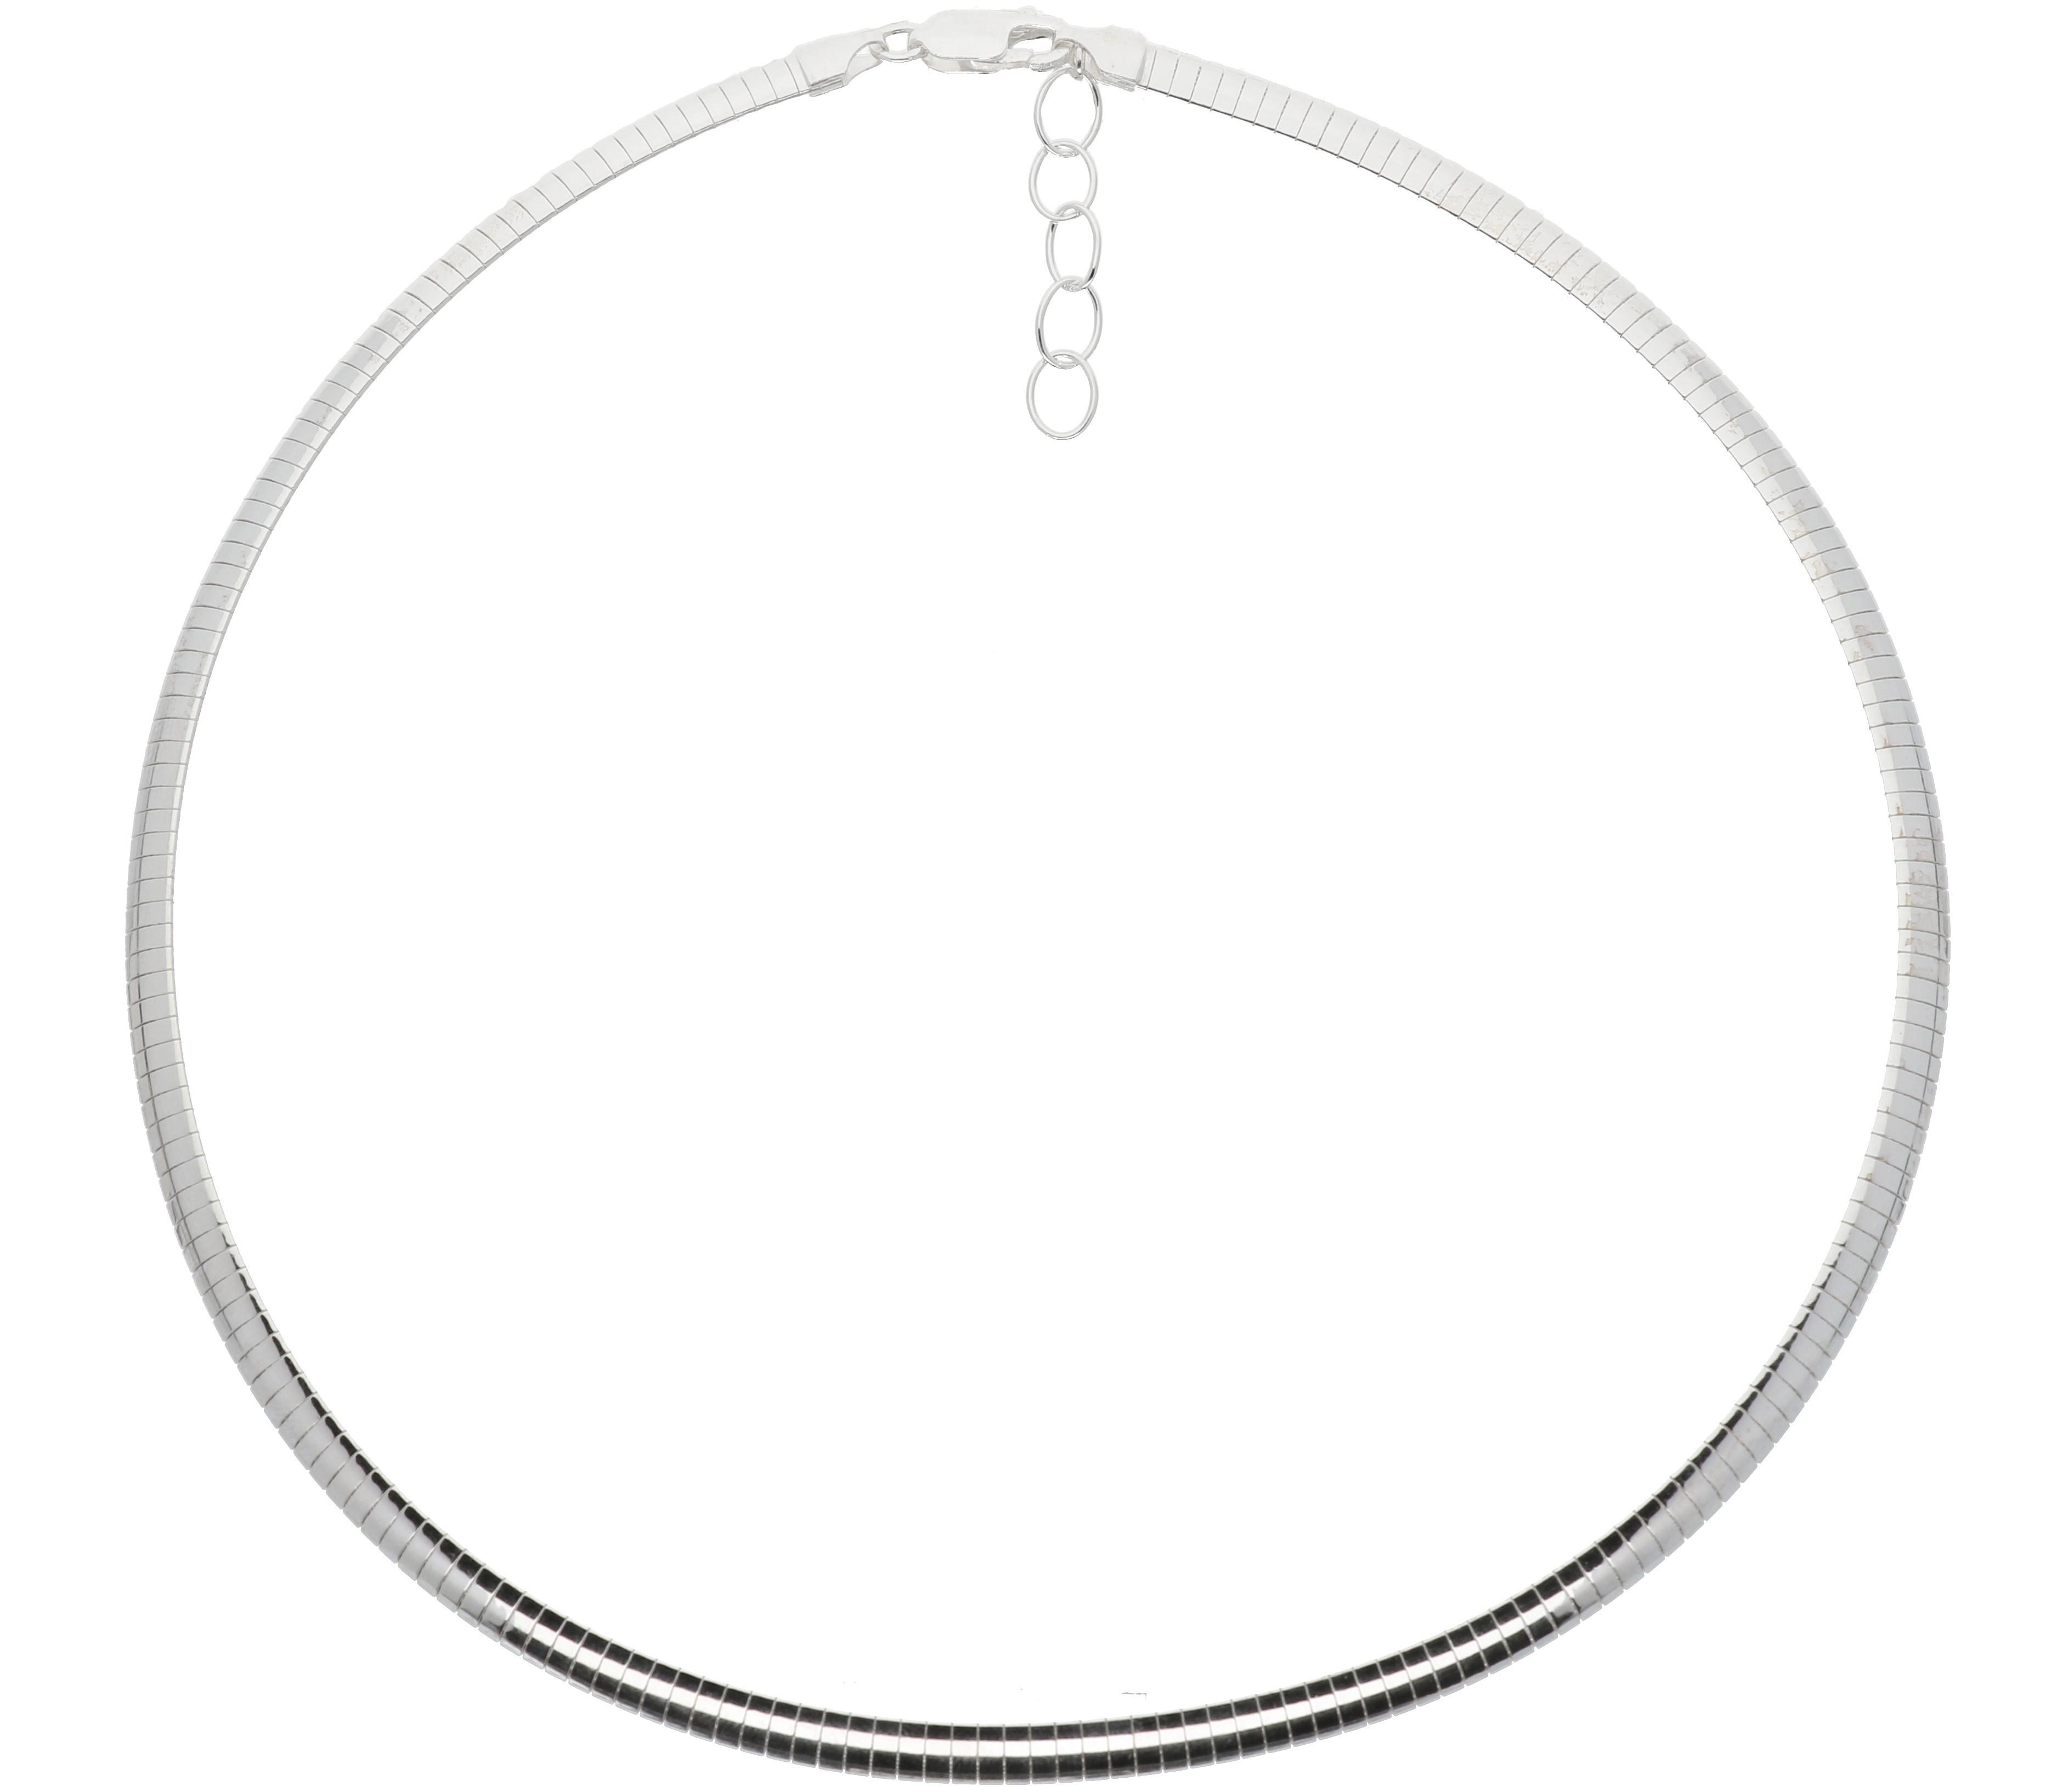 Zilveren omegacollier best basics Halfrond 5.0 mm 103.7038.43